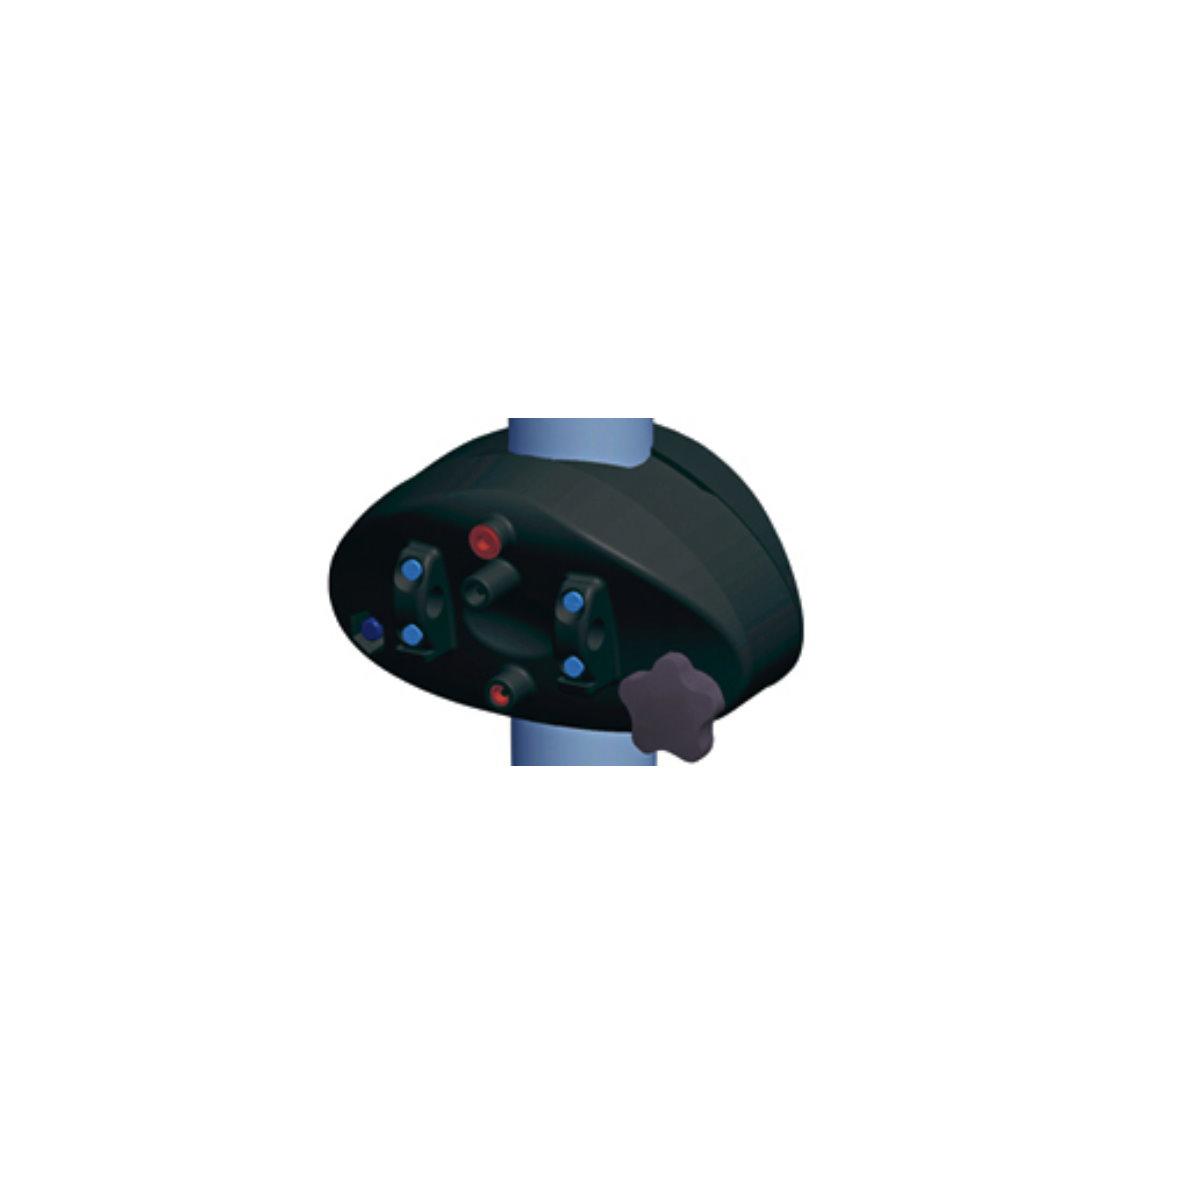 elektro seilwinde 230v seilwinde 800kg elektrisch 230v seilzug winde hebezug neu elektro. Black Bedroom Furniture Sets. Home Design Ideas